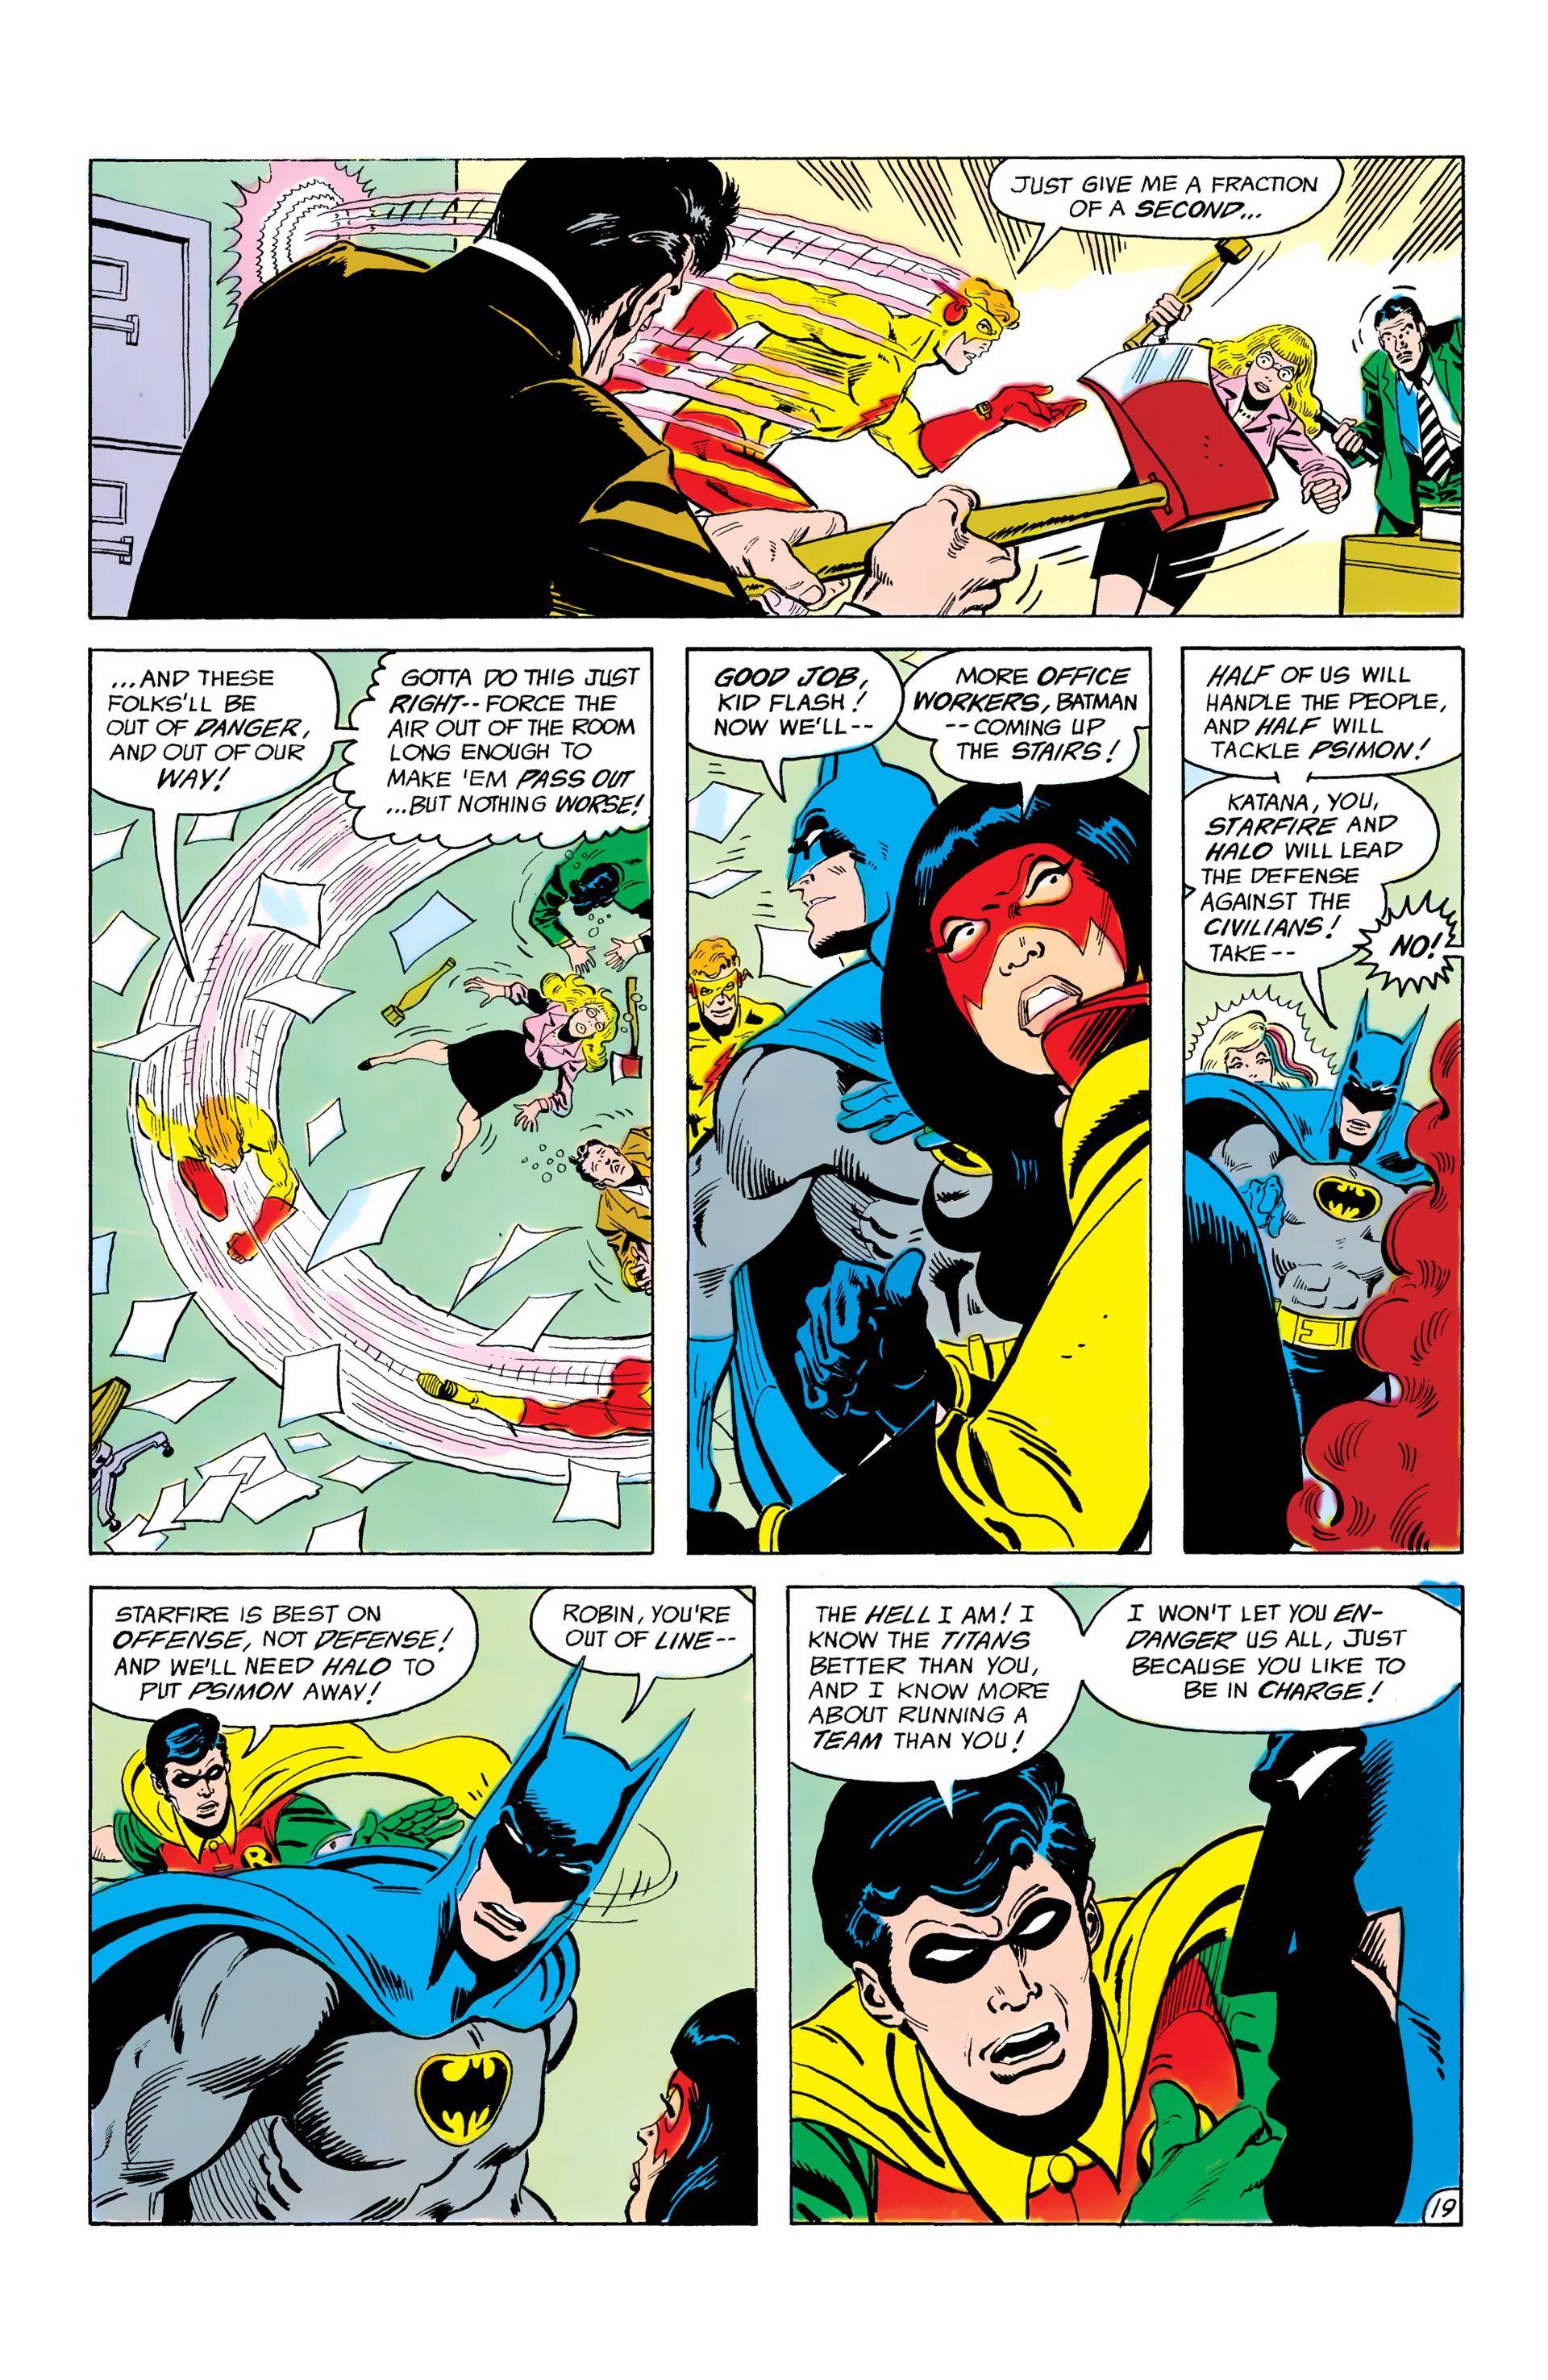 Batman And The Outsiders 1983 5 Read Batman And The Outsiders 1983 Issue 5 Online Full Page The Outsiders 1983 The Outsiders Batman